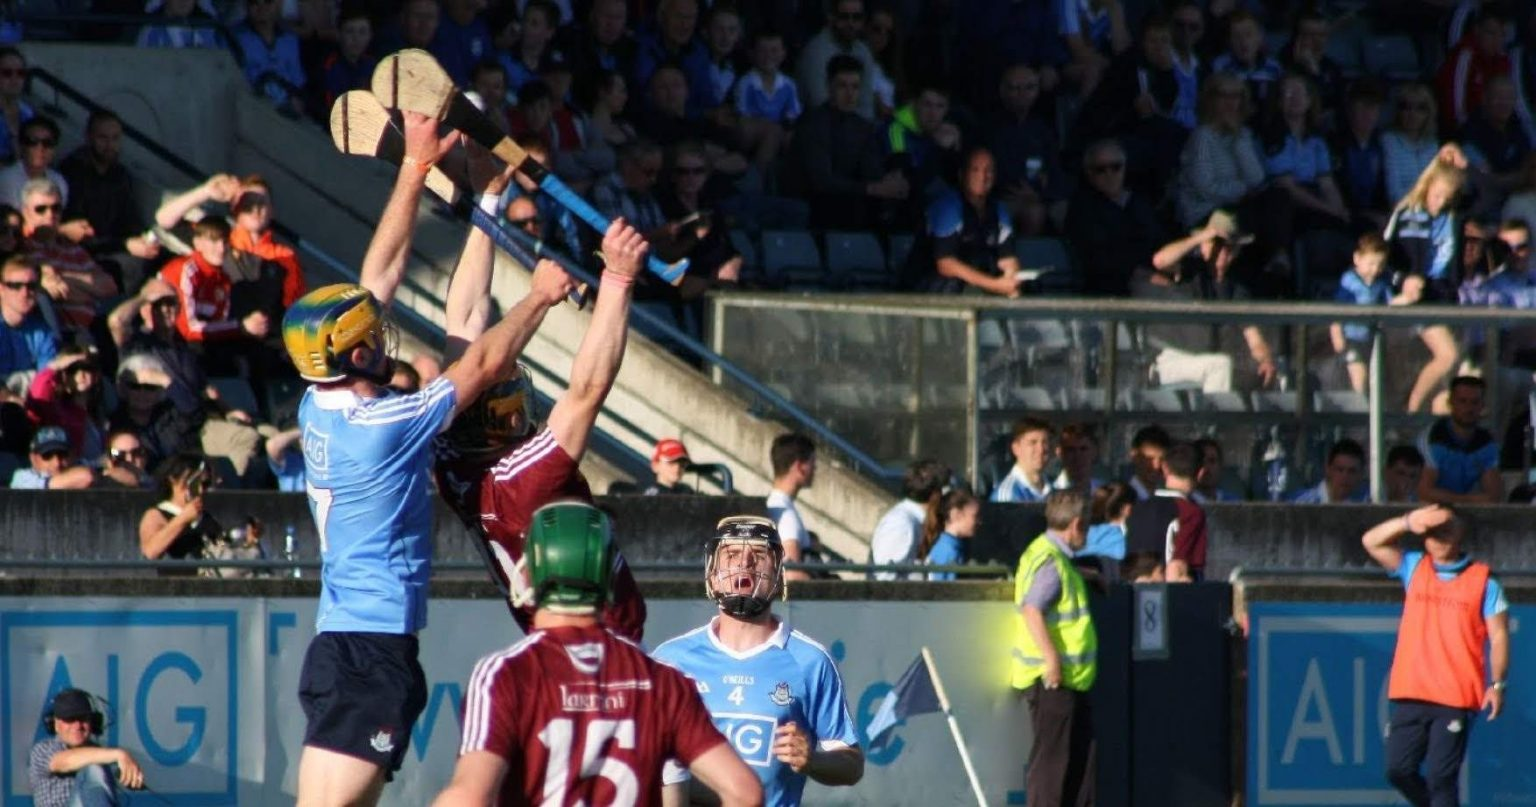 Dublin U21 Hurlers Chosen For Leinster Quarter Final Clash With Westmeath